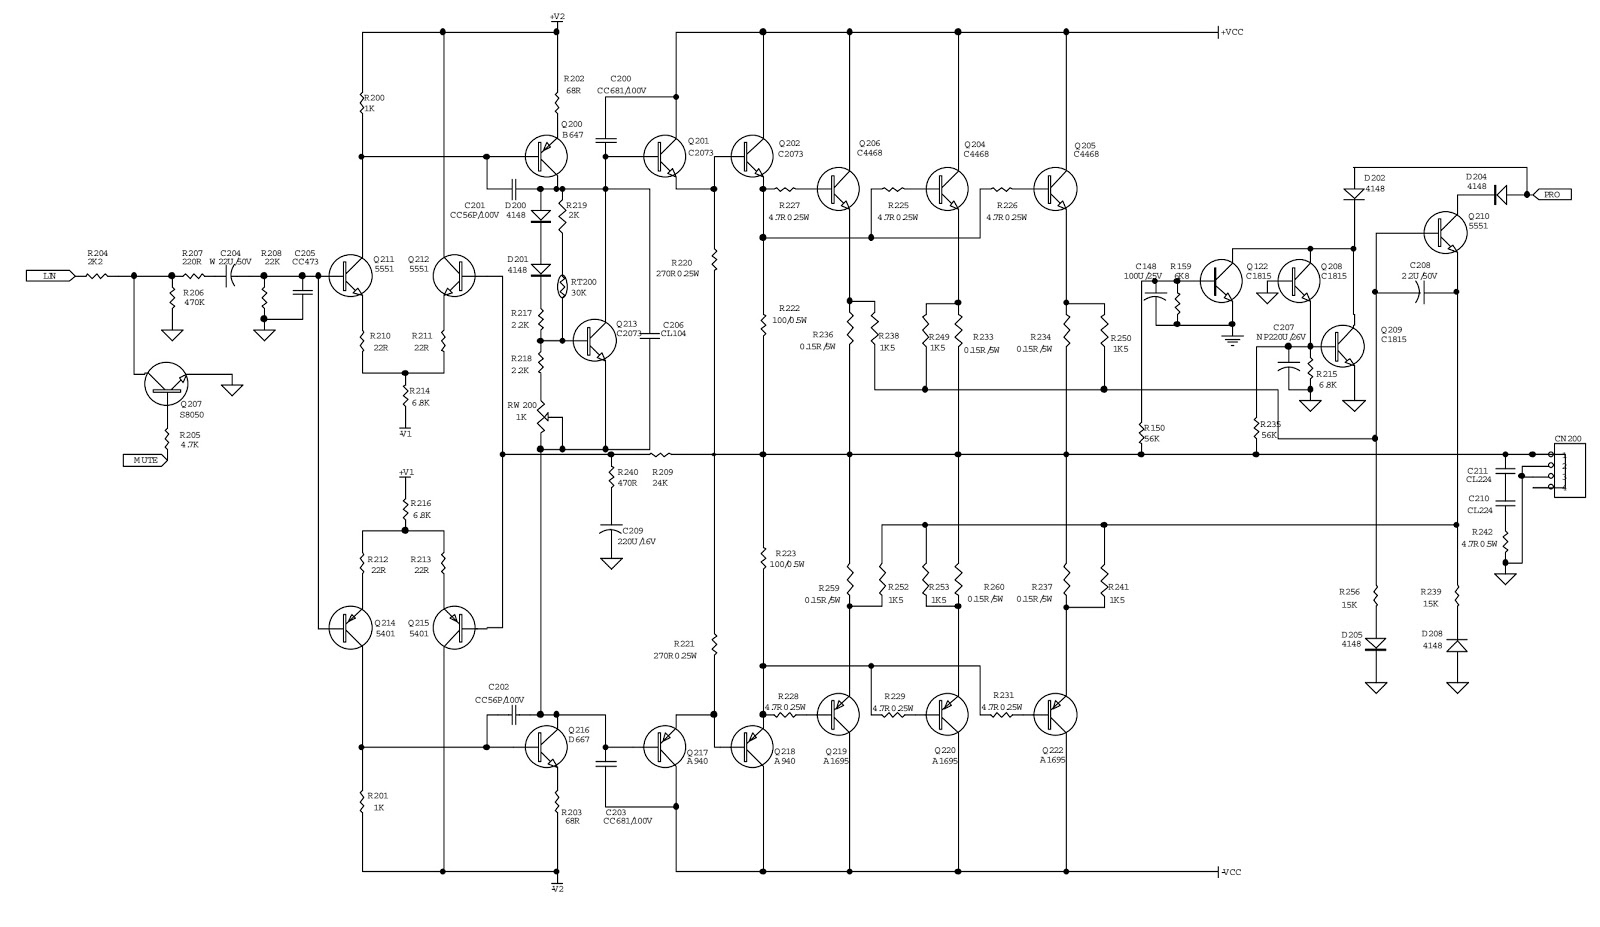 rem amplifier wiring diagram with Y2fylwf1zglvlxbvd2vylwftcc1zy2hlbwf0awm on Sony Xplod Speaker Wiring in addition 23zj87 additionally 28js45 as well CHEVROLET Car Radio Wiring Connector further Wiring Diagram Masthead  lifier   For Name Views Siz E361be.